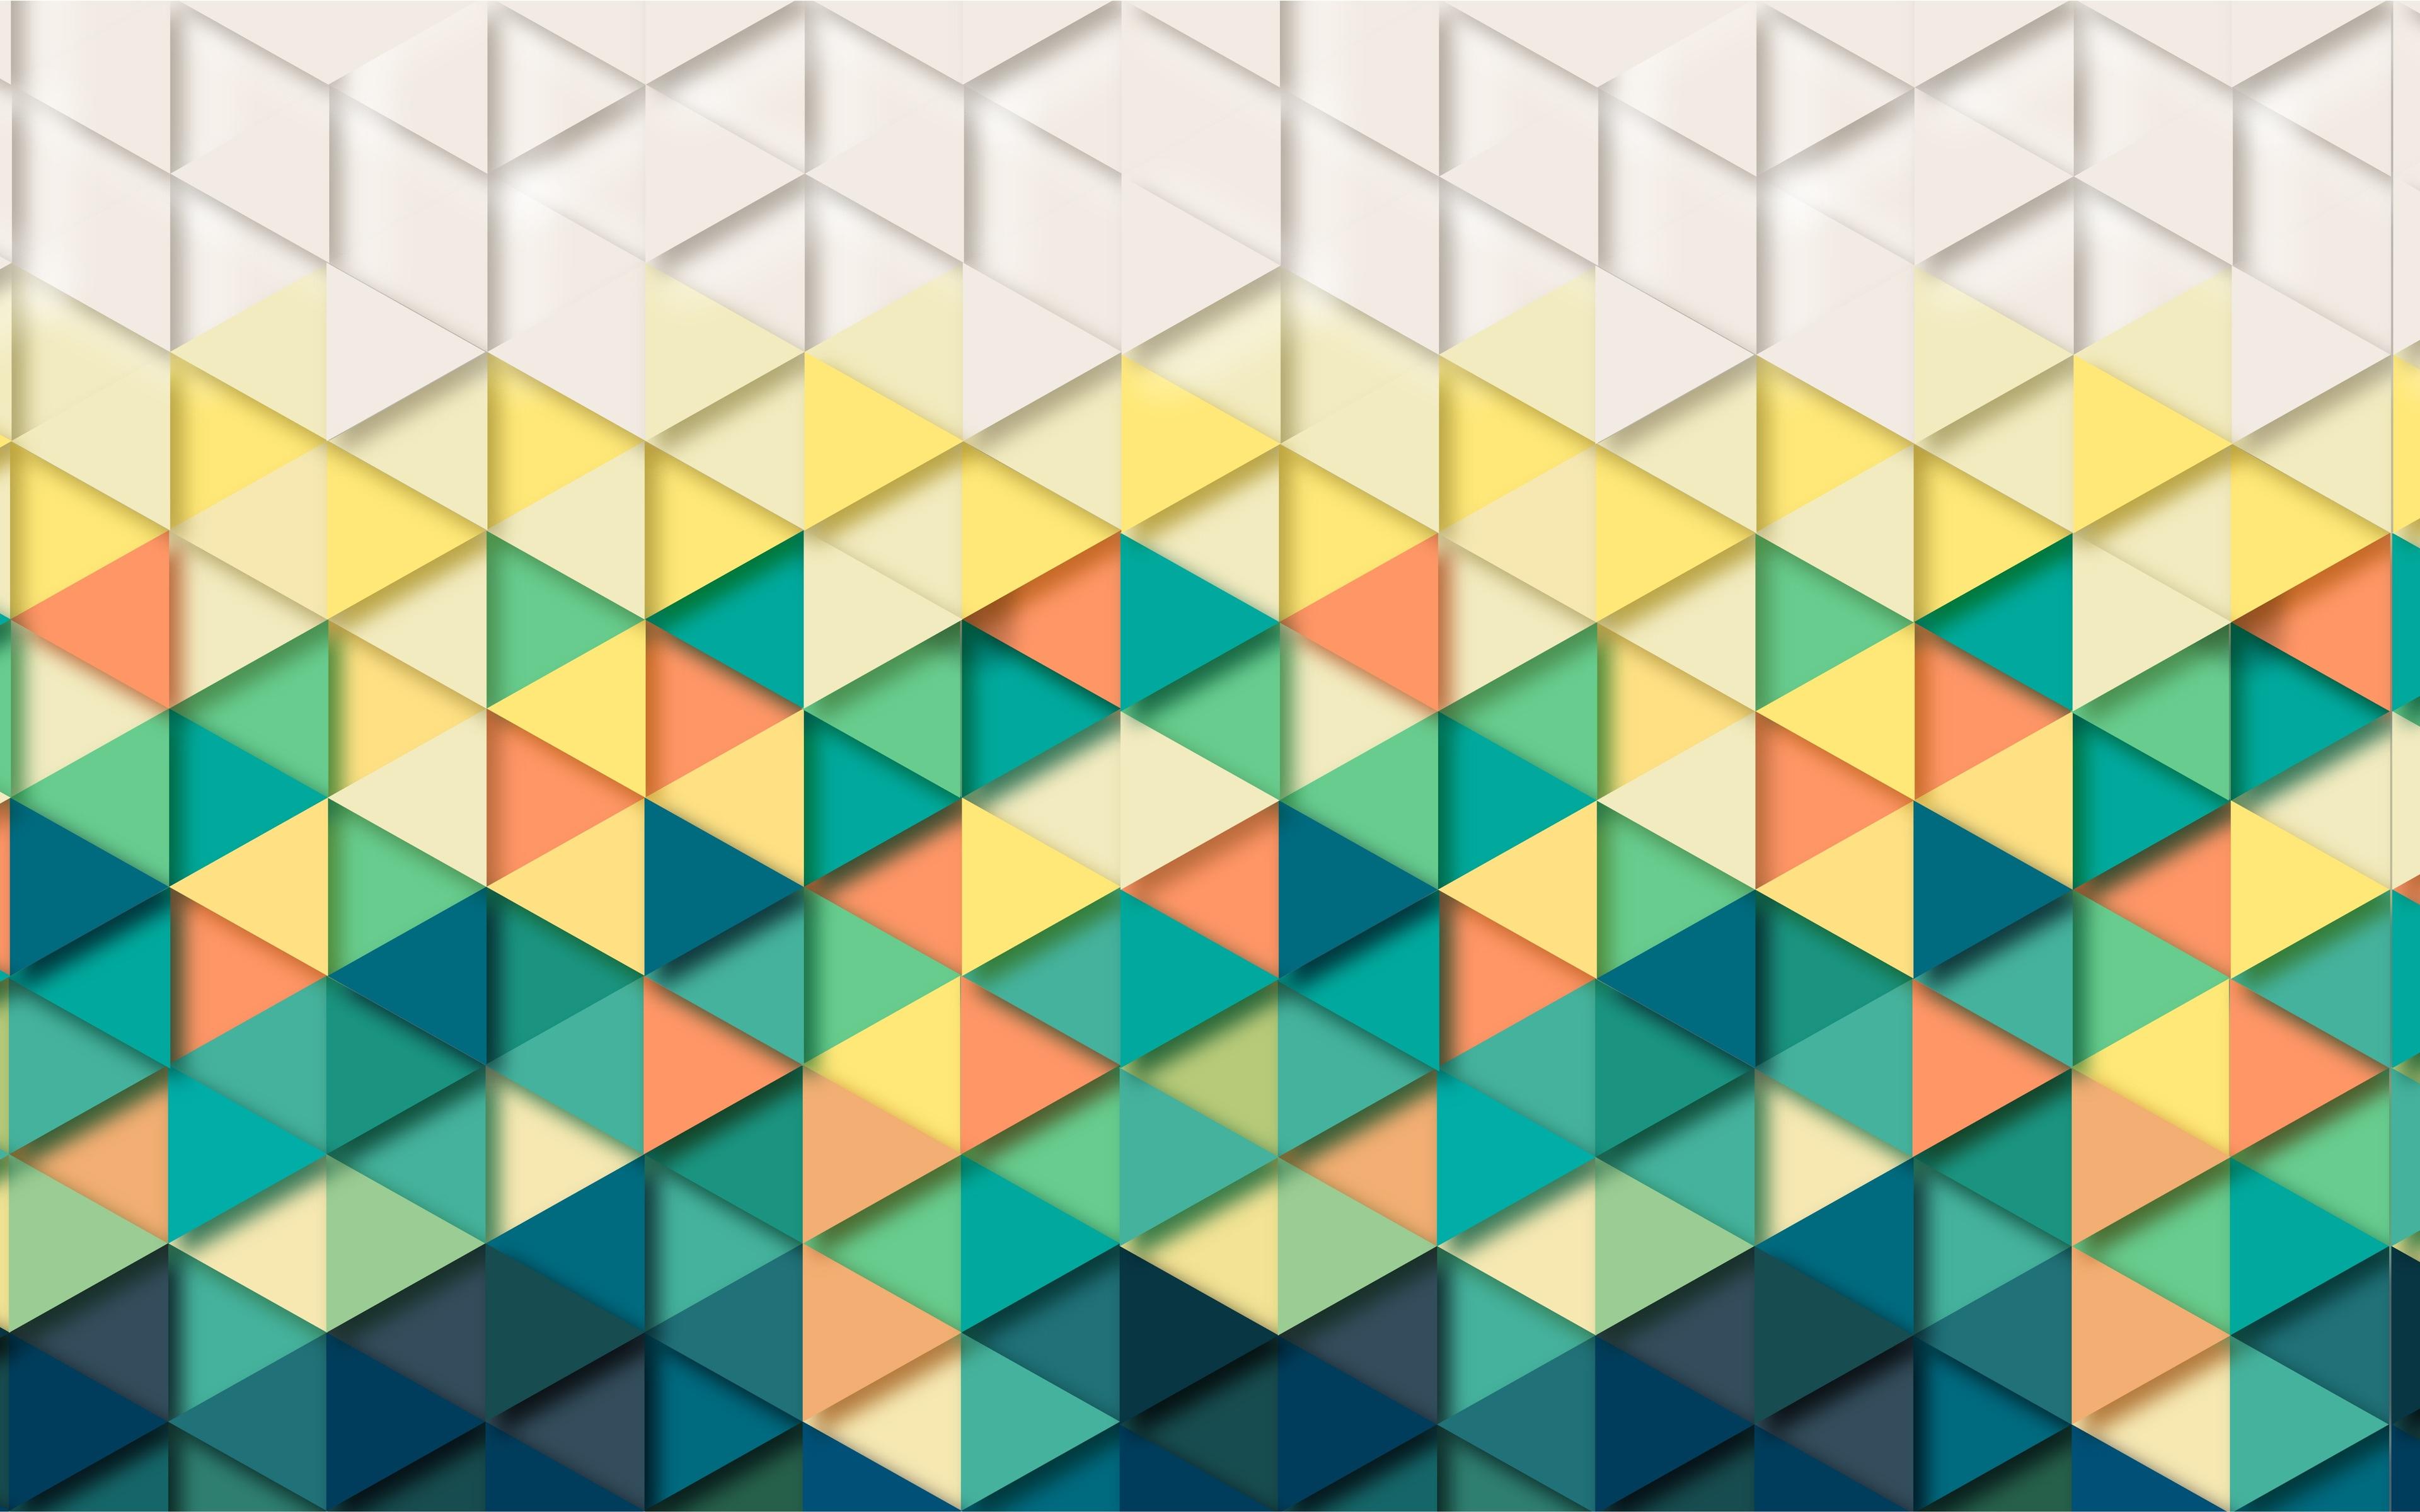 triangle-pattern-8k-dh.jpg